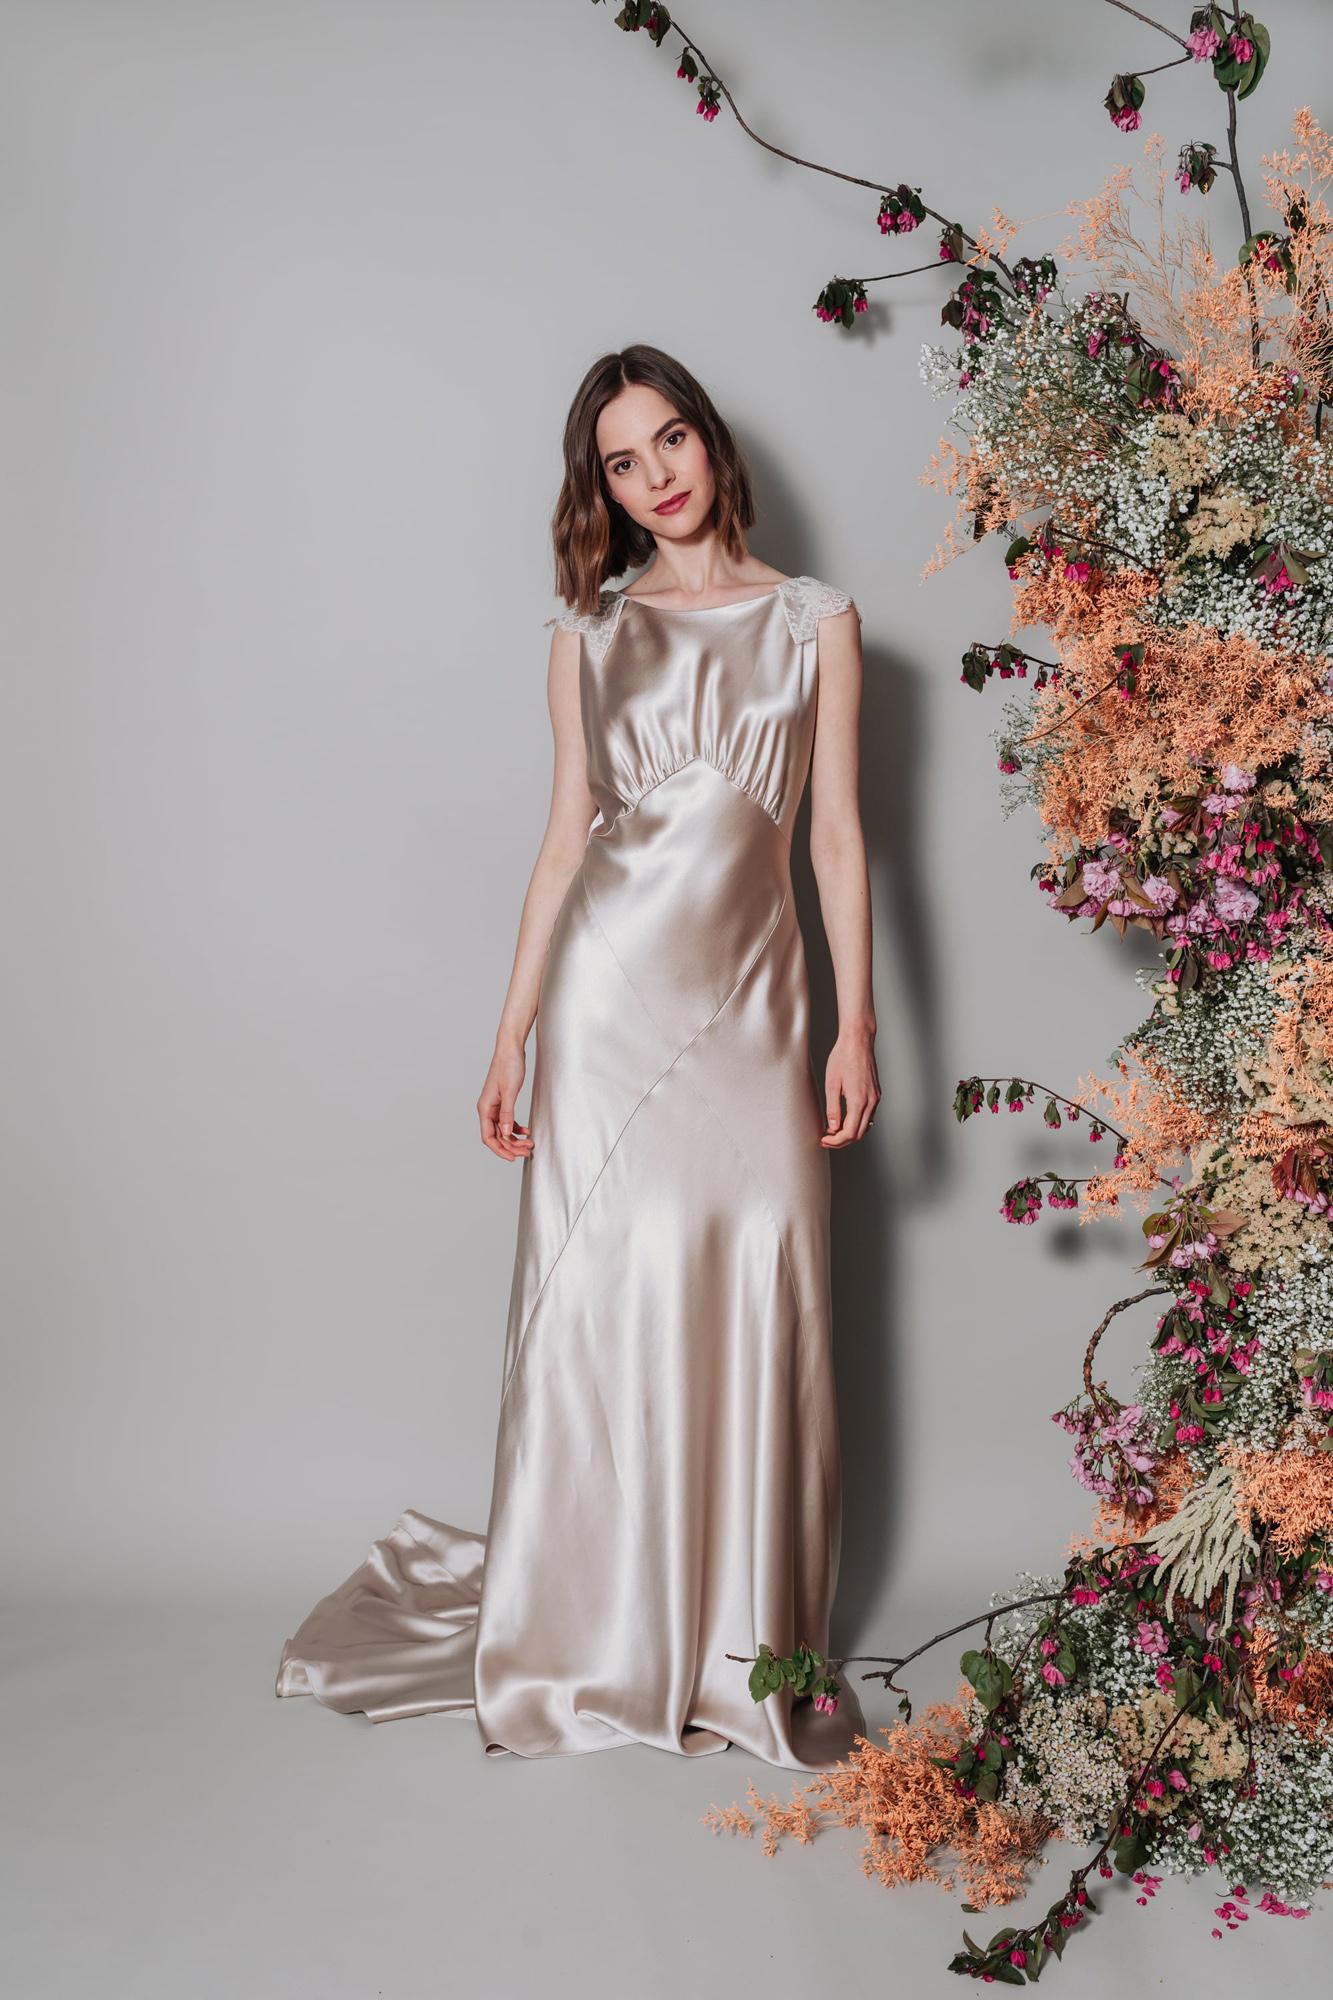 Kate-Beaumont-Sheffield-Honeysuckle-Bias-Cut-Silk-Panelled-Wedding-Gown-4.jpg